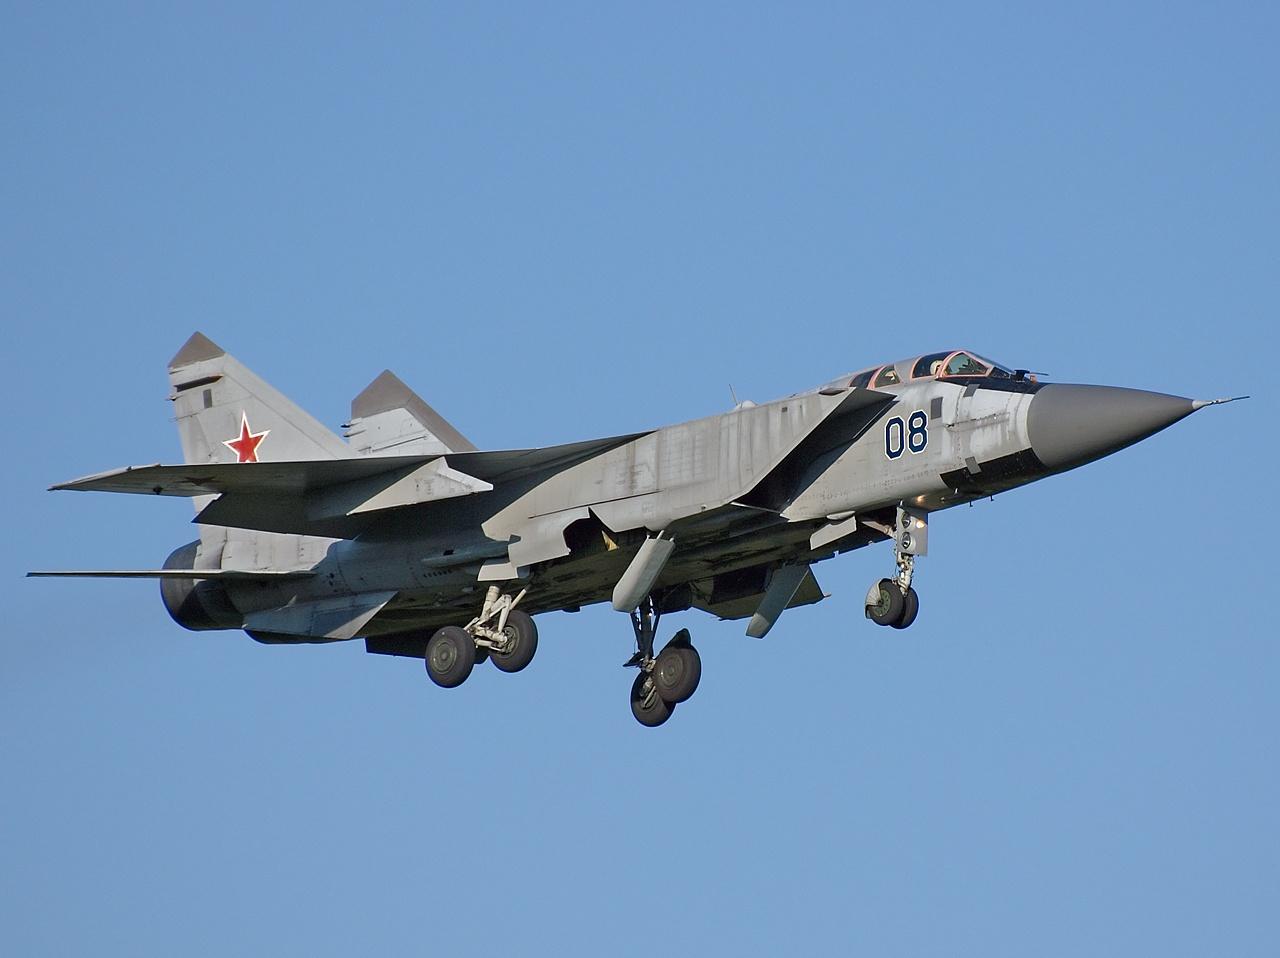 Mikoyan Gurevich Mig 31 The Foxhound Landing Gear Retracted Aircraft